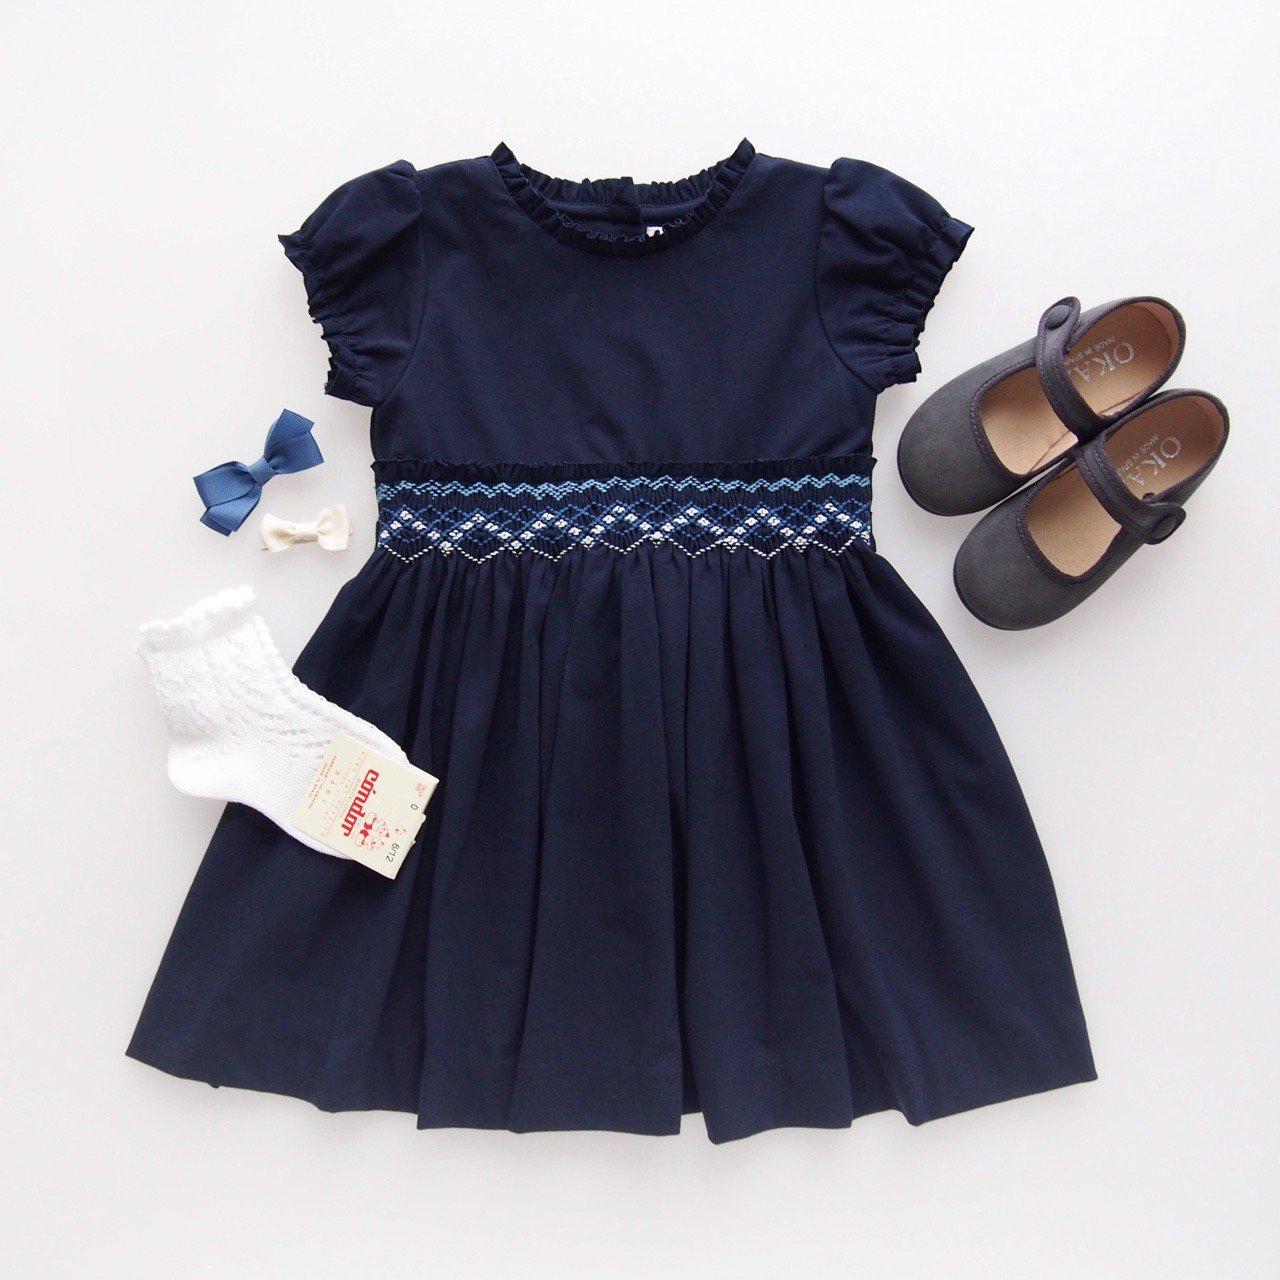 <img class='new_mark_img1' src='https://img.shop-pro.jp/img/new/icons14.gif' style='border:none;display:inline;margin:0px;padding:0px;width:auto;' />Malvi&Co. - Jersey smocked dress (Navy)